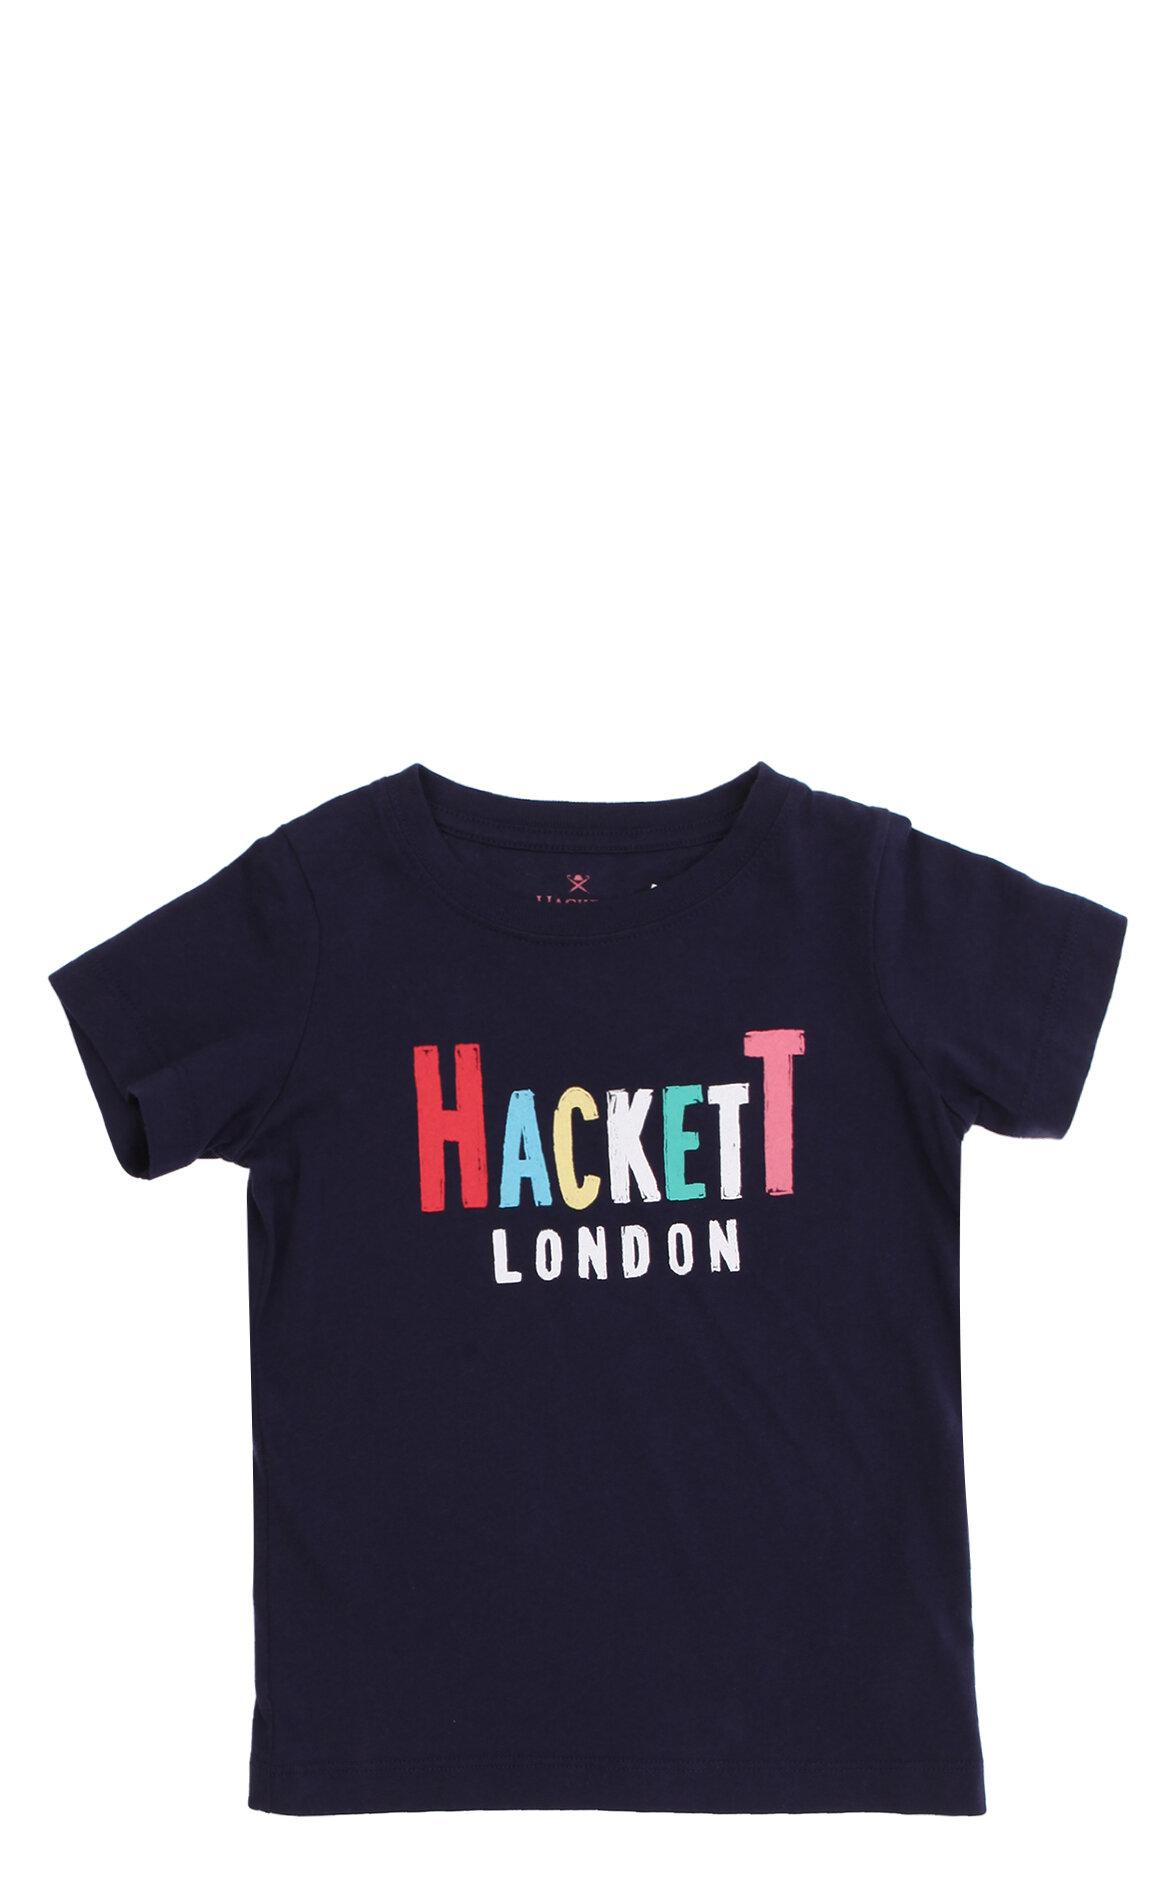 Hackett Erkek Çocuk  Baskı Desen Lacivert T-Shirt